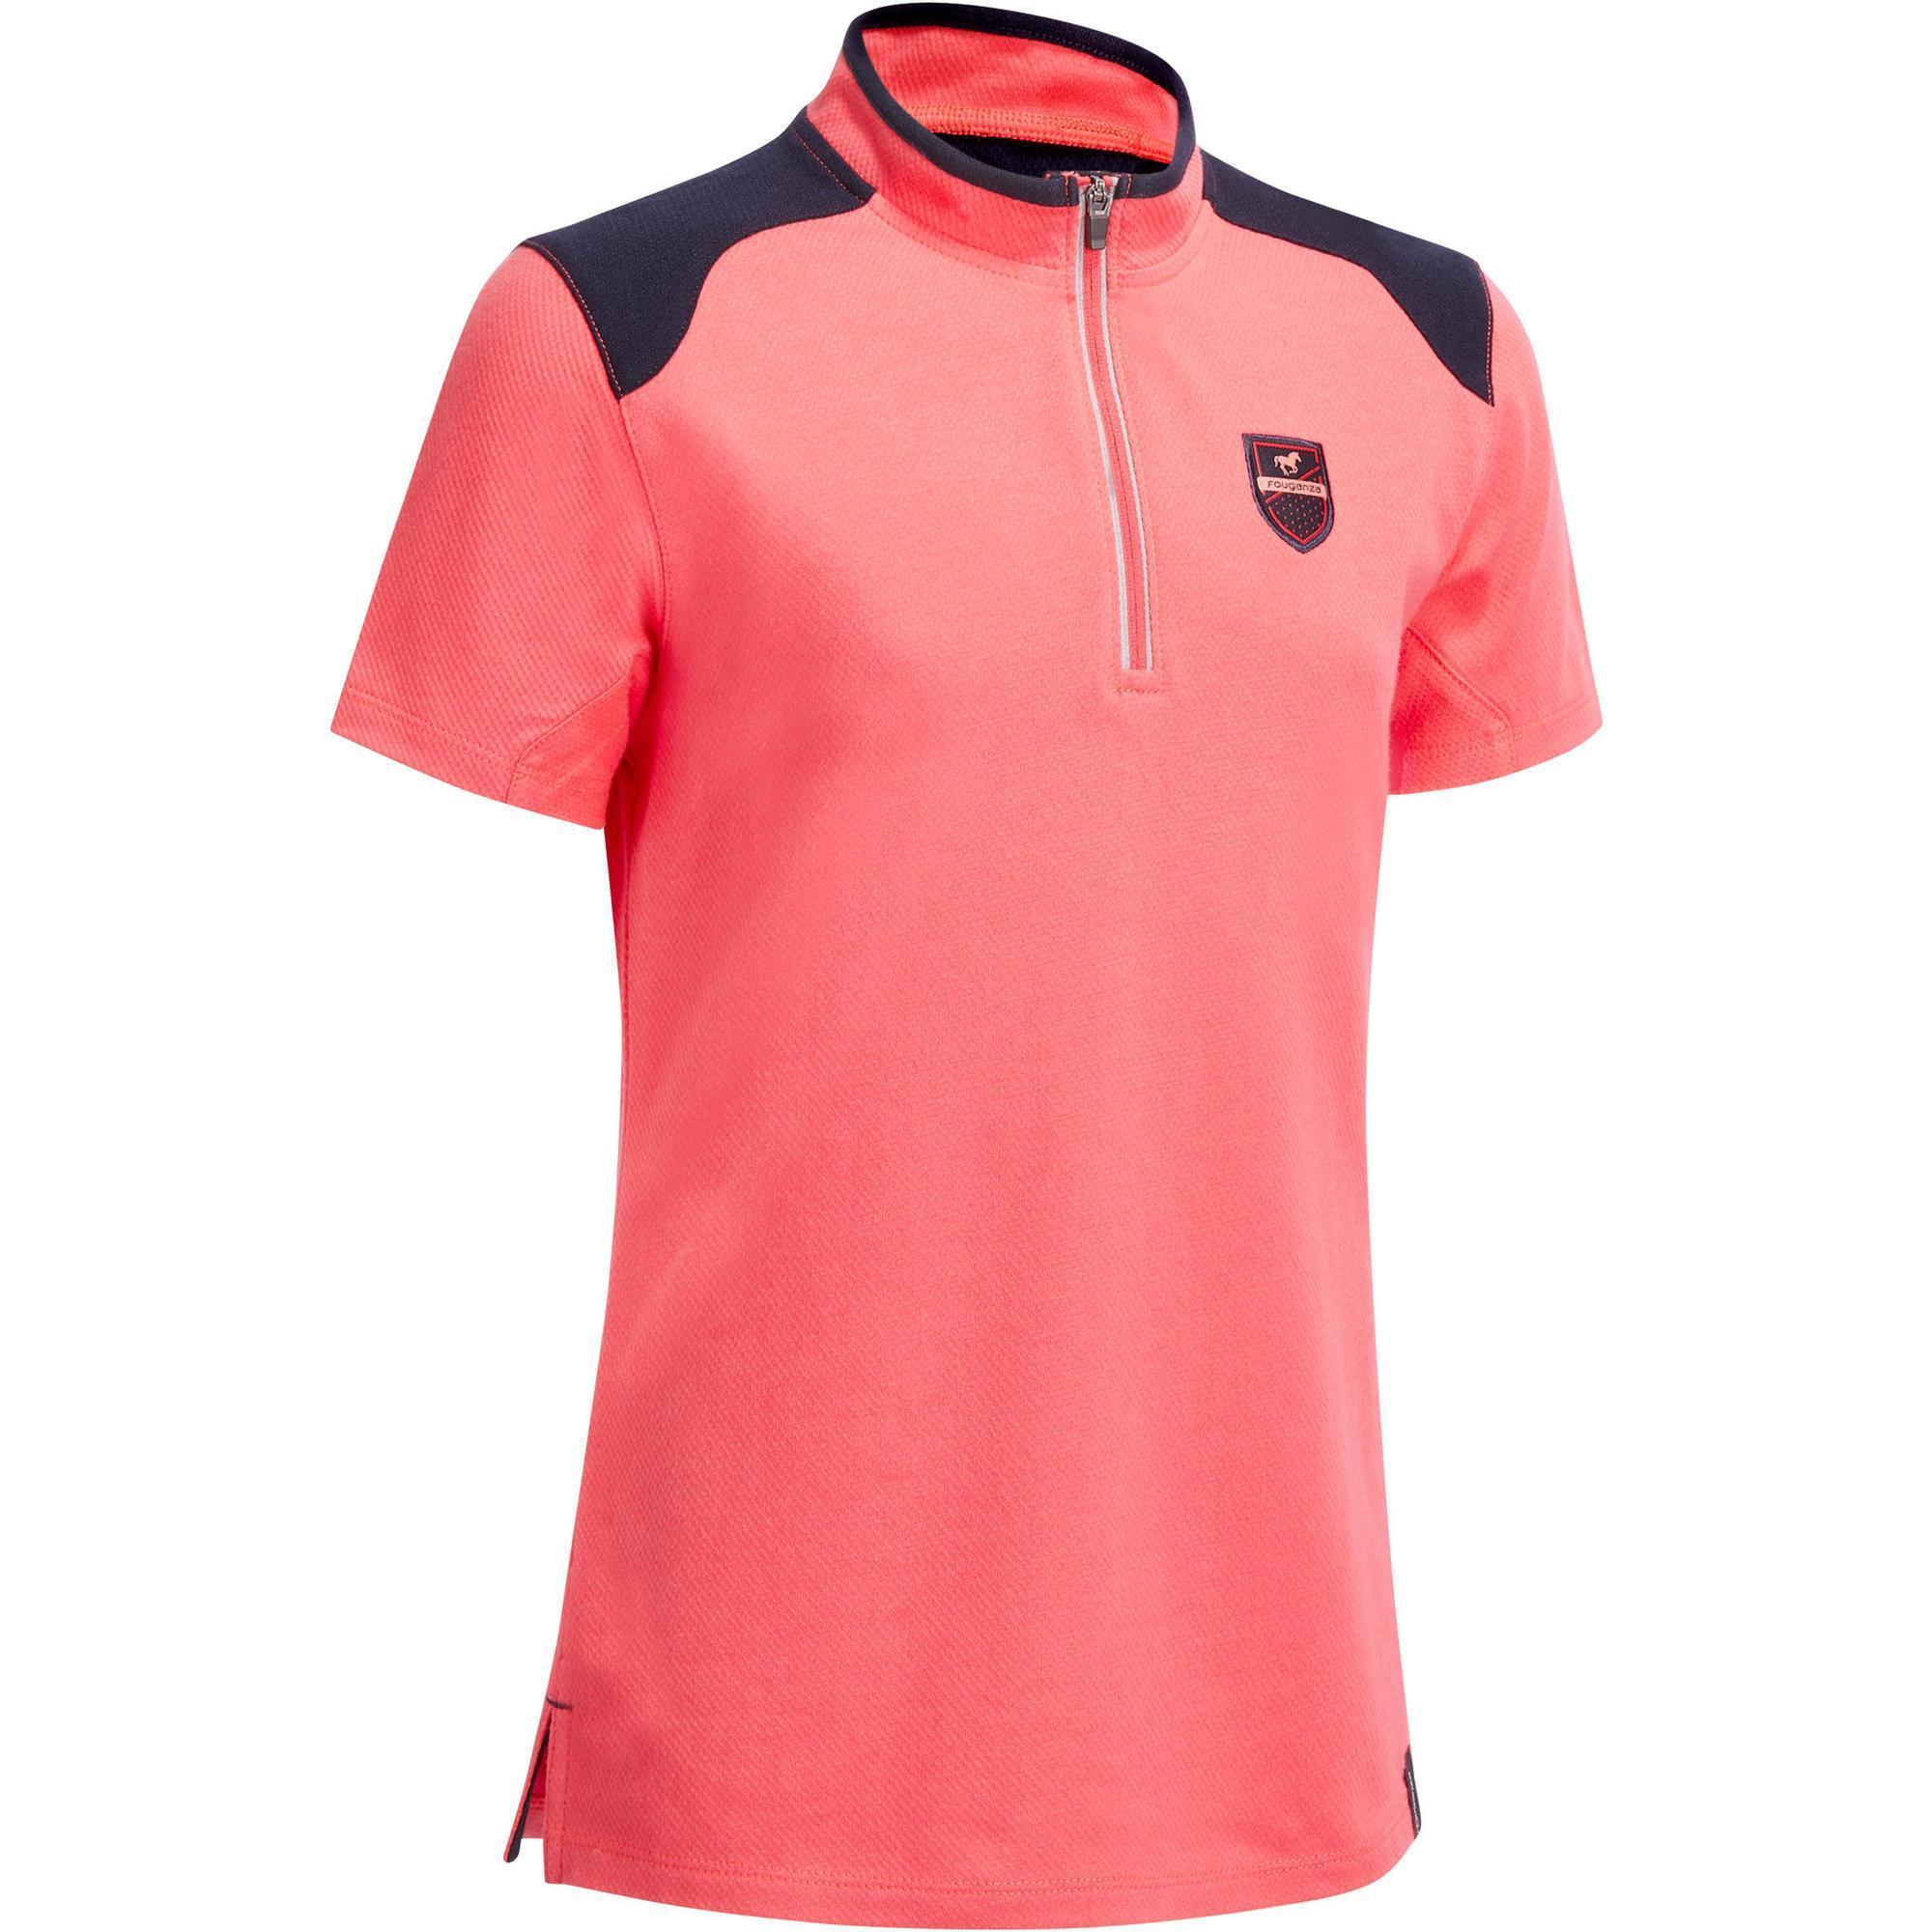 Fouganza Polo korte mouwen ruitersport meisjes PL500 roze/marineblauw